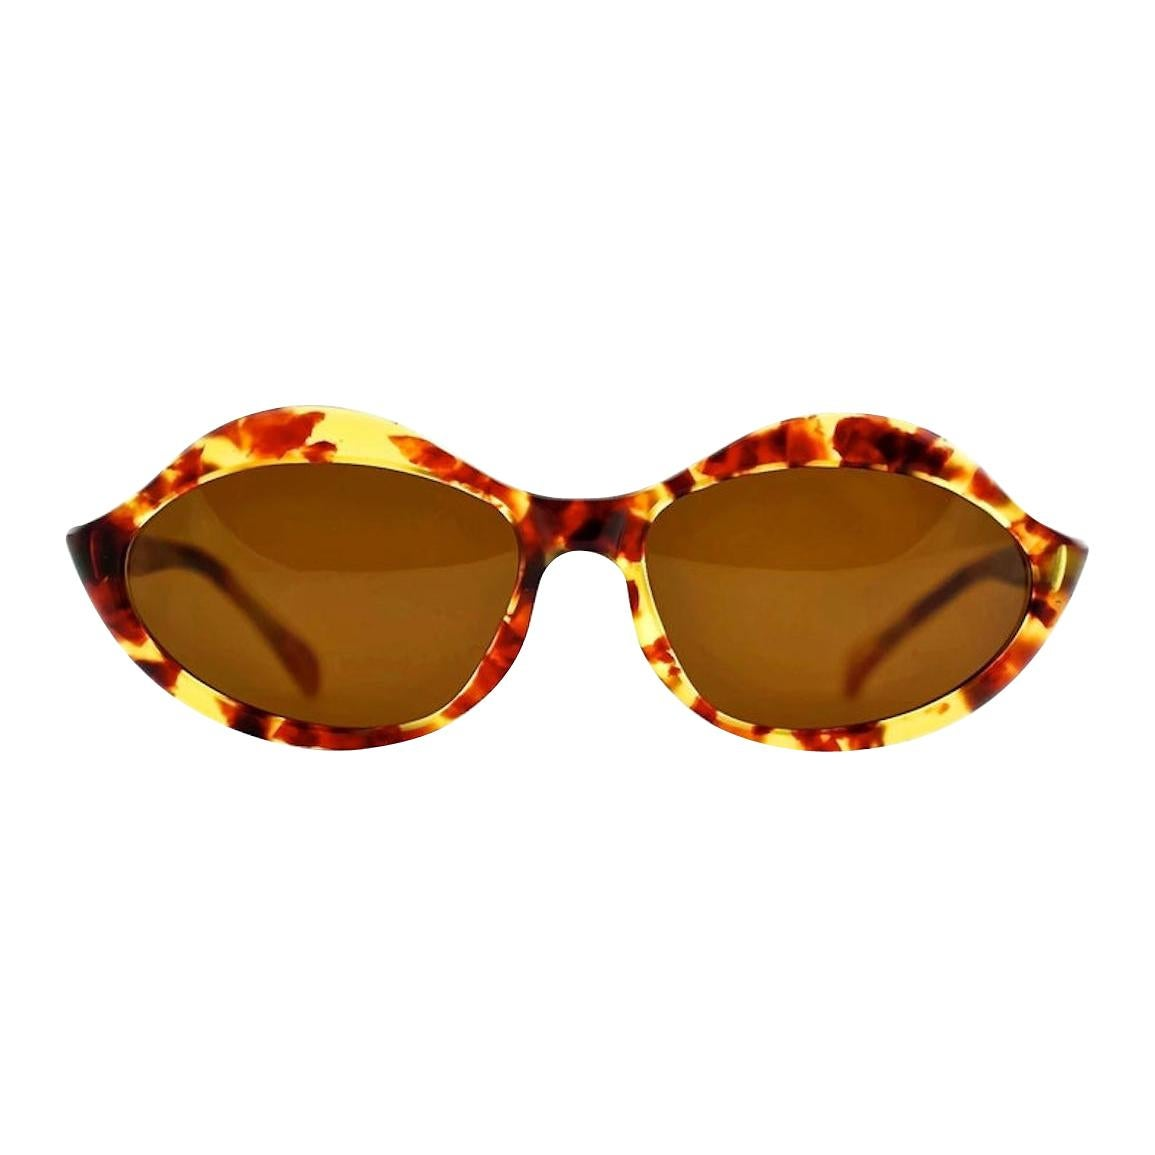 "Vintage 1960s Iconic PIERRE CARDIN ""LIPS"" Light Tortoise Sunglasses"